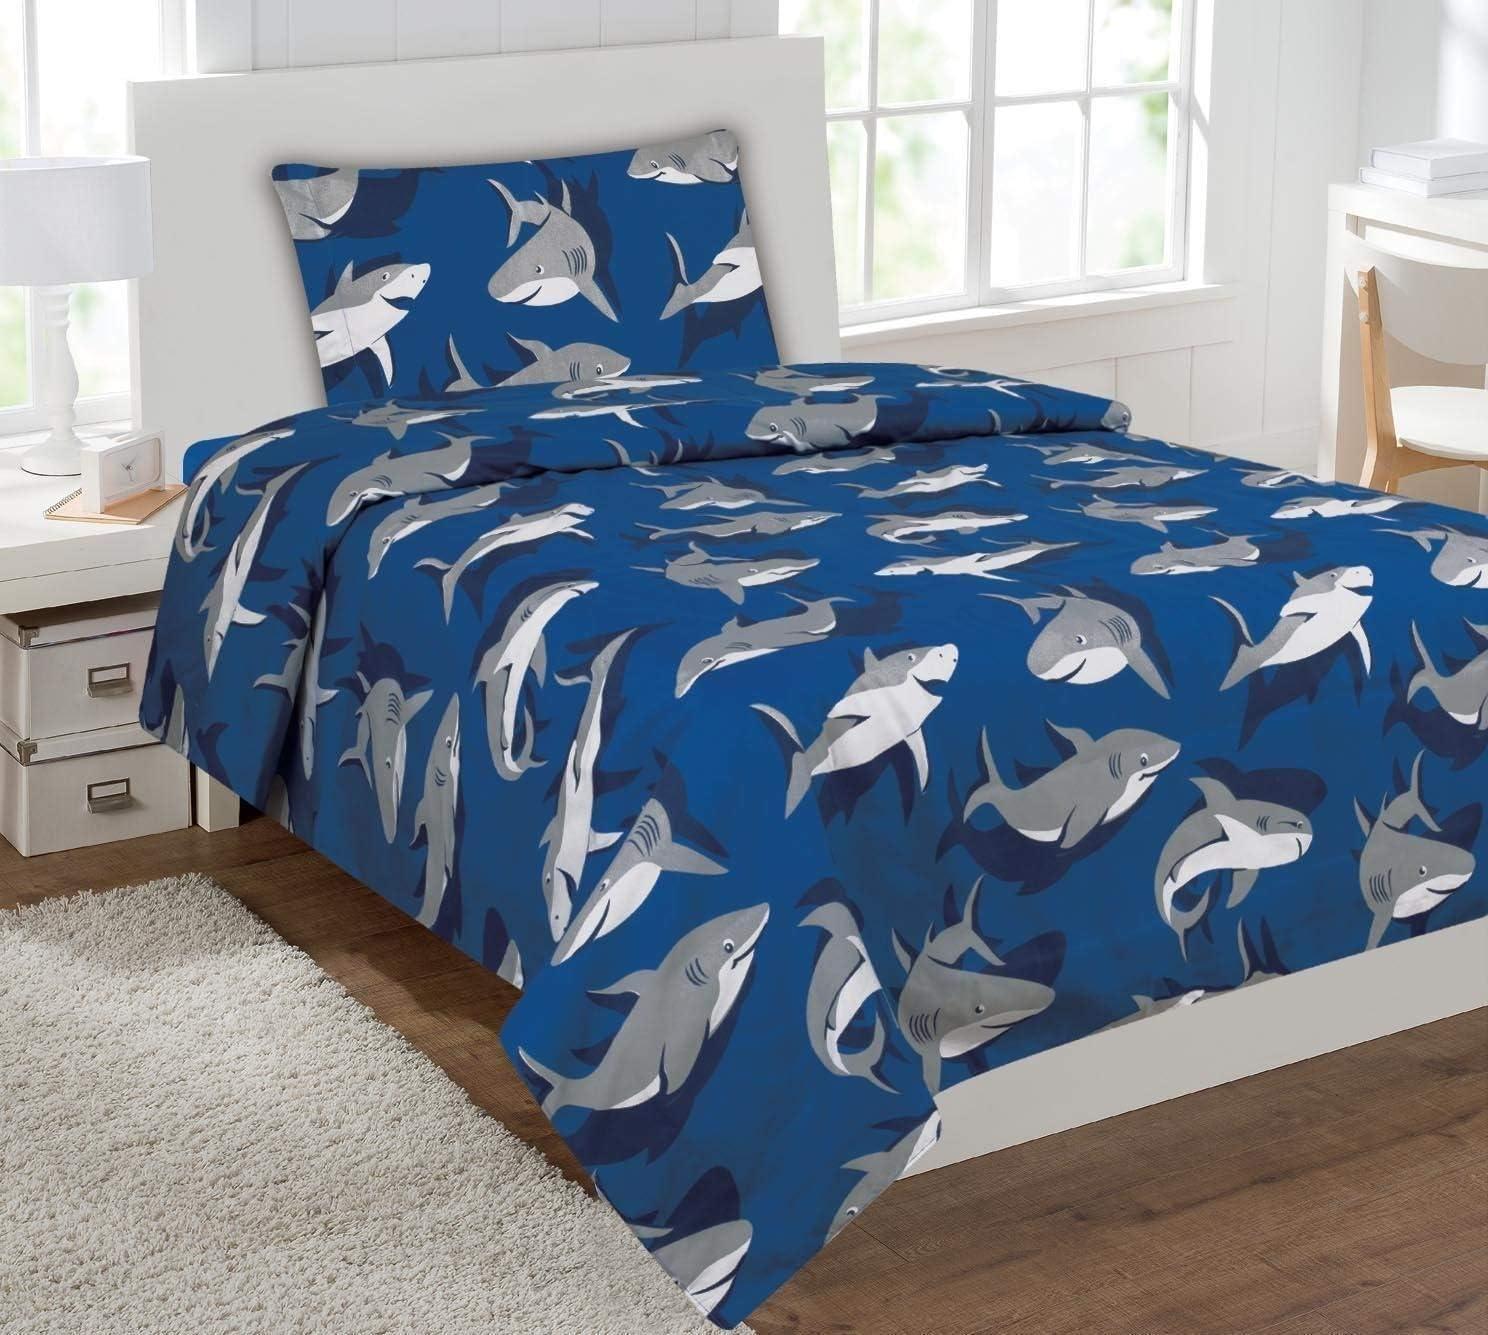 Fancy Collection 3pc Twin Size Kids/teens Blue Grey Shark Design Luxury Sheet Set New